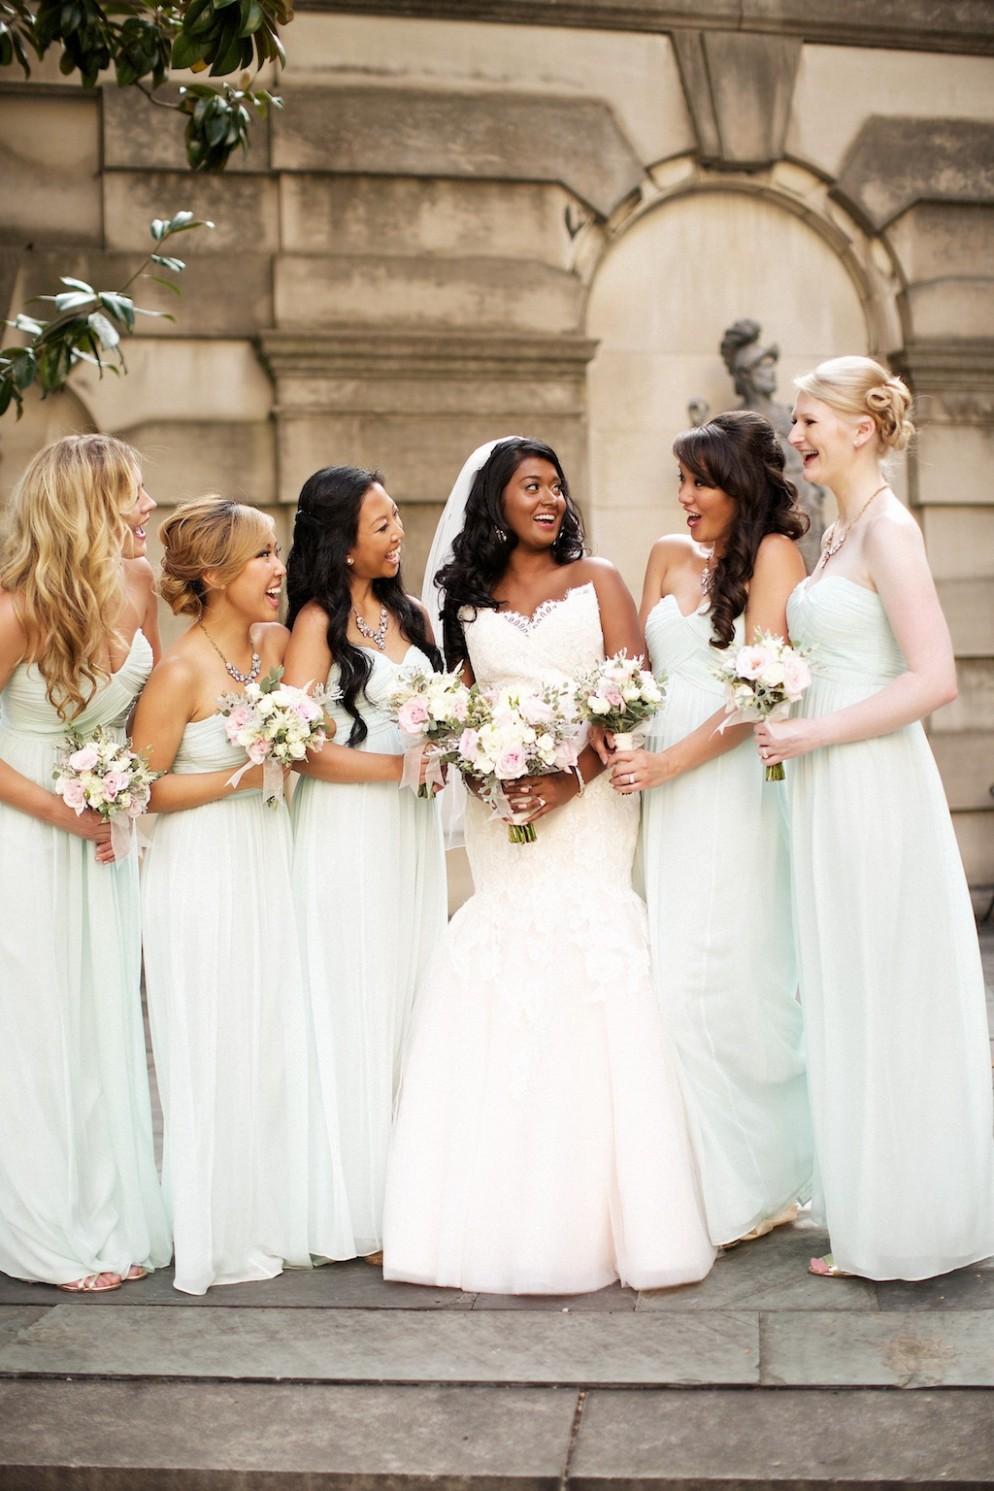 1-27-16-pastel-wedding-anderson-house-washington-dc-9-994x1491.jpg